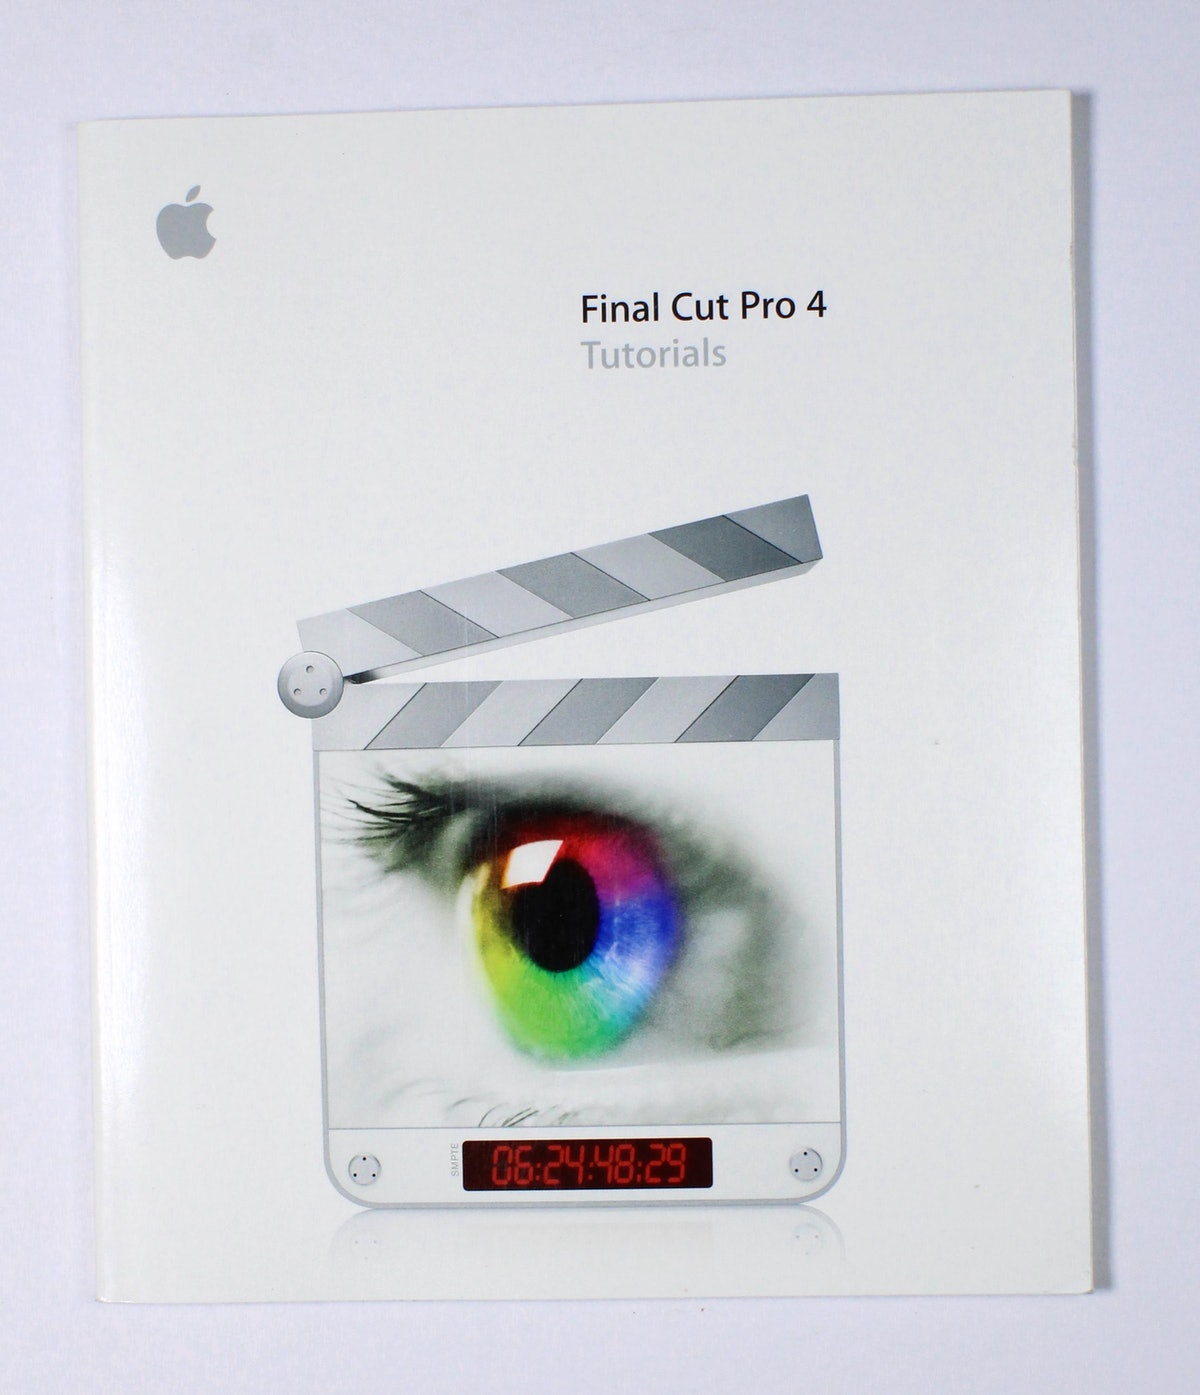 Apple - Final Cut Pro 4 - Tutorials